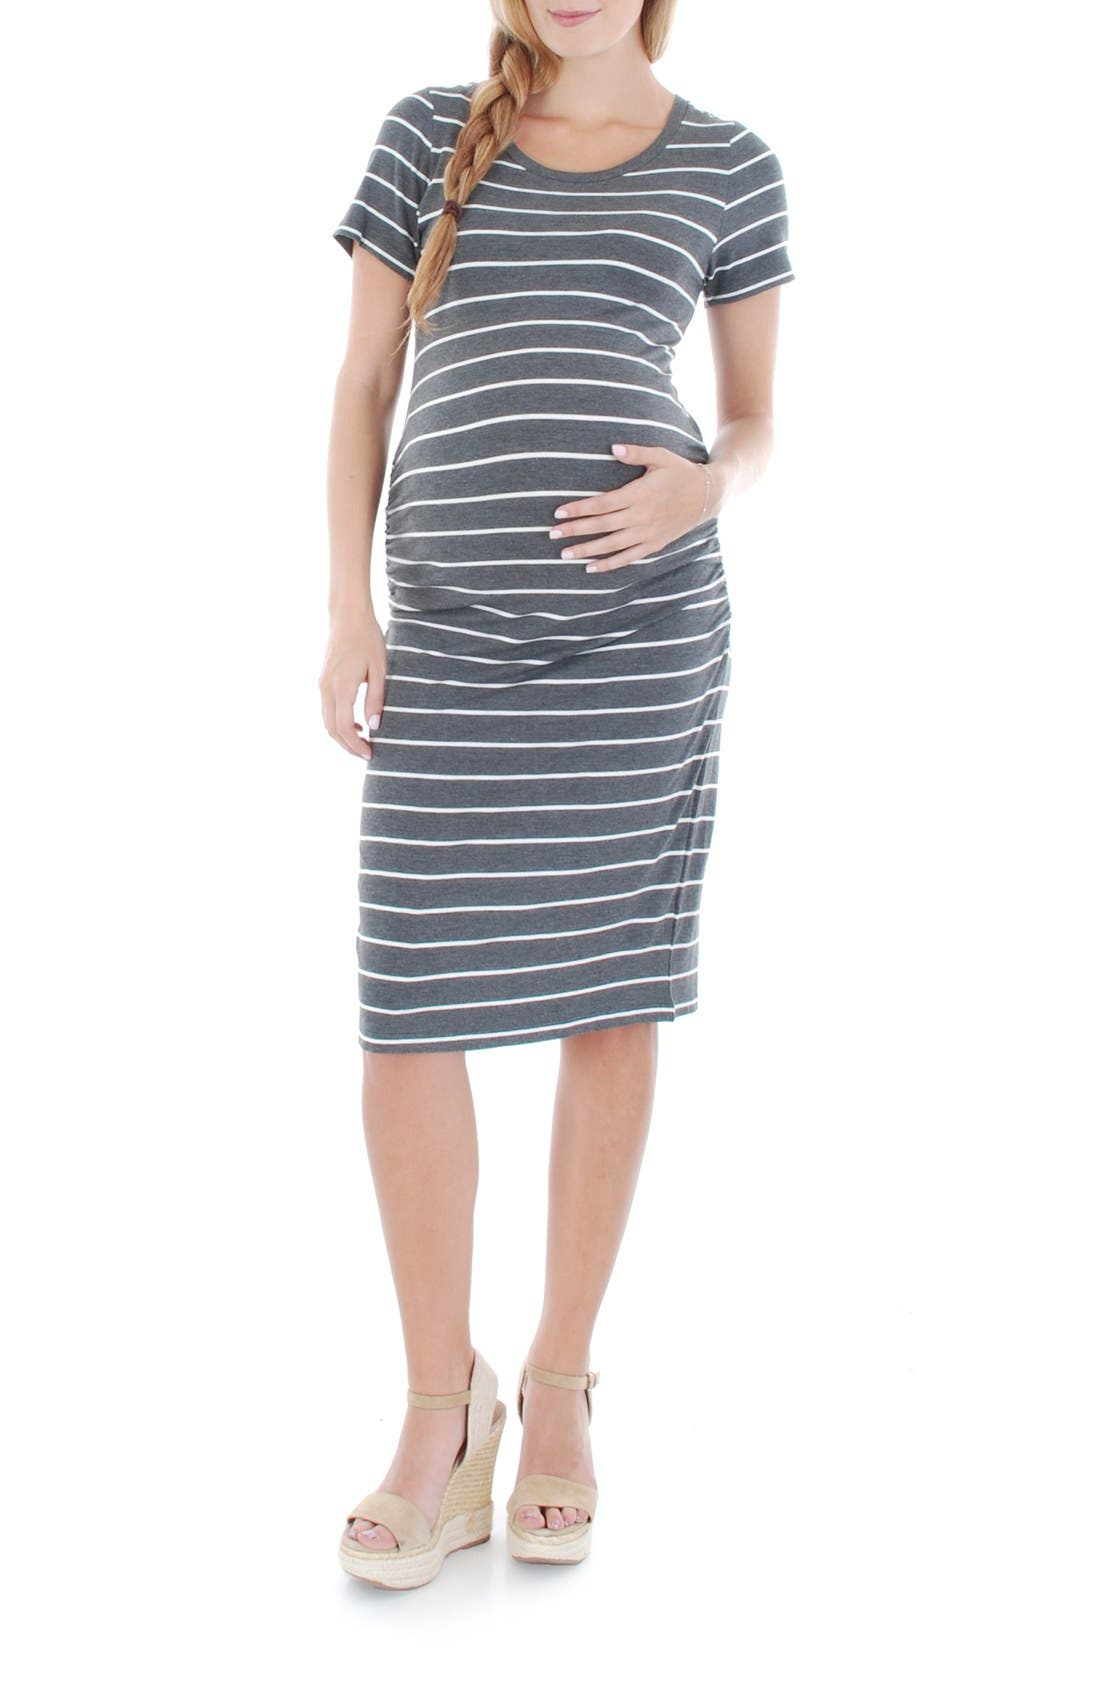 EVERLY GREY Camila Stripe Maternity Dress